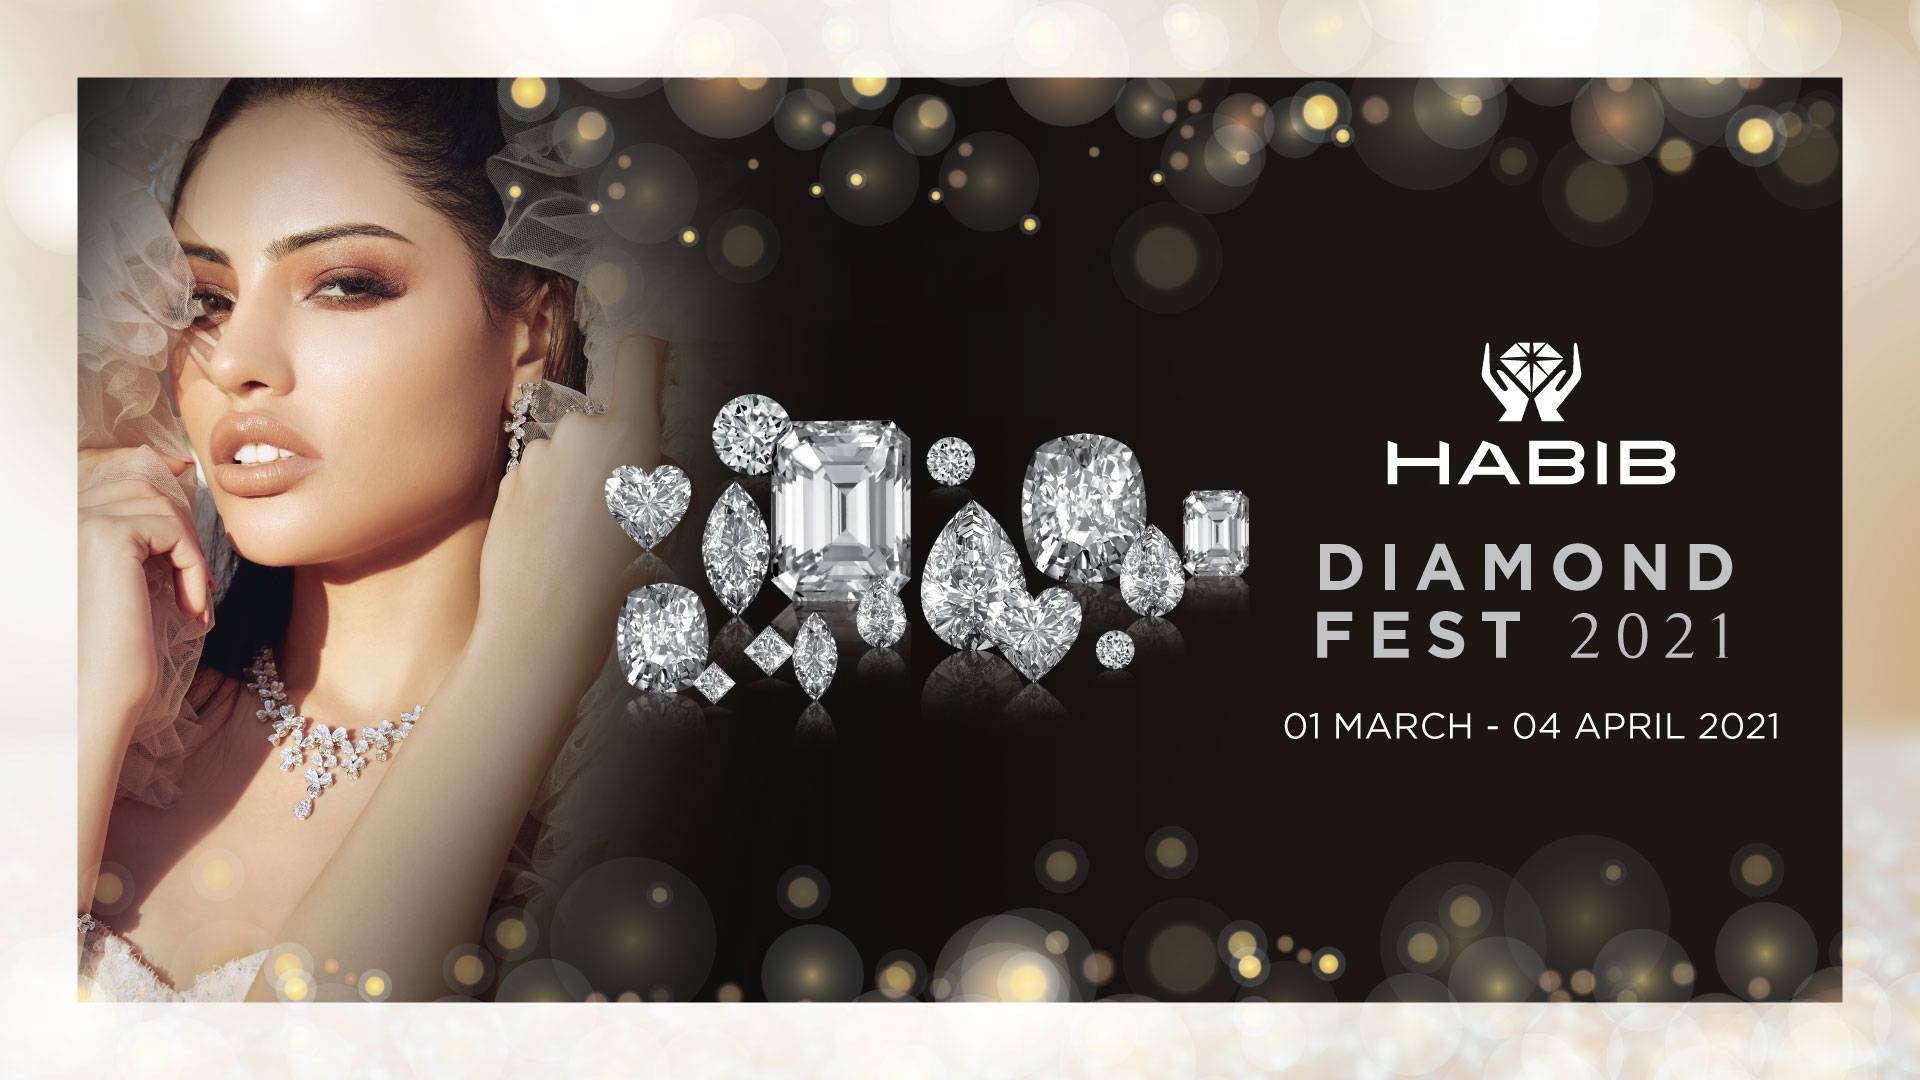 Diamond Fest 2021